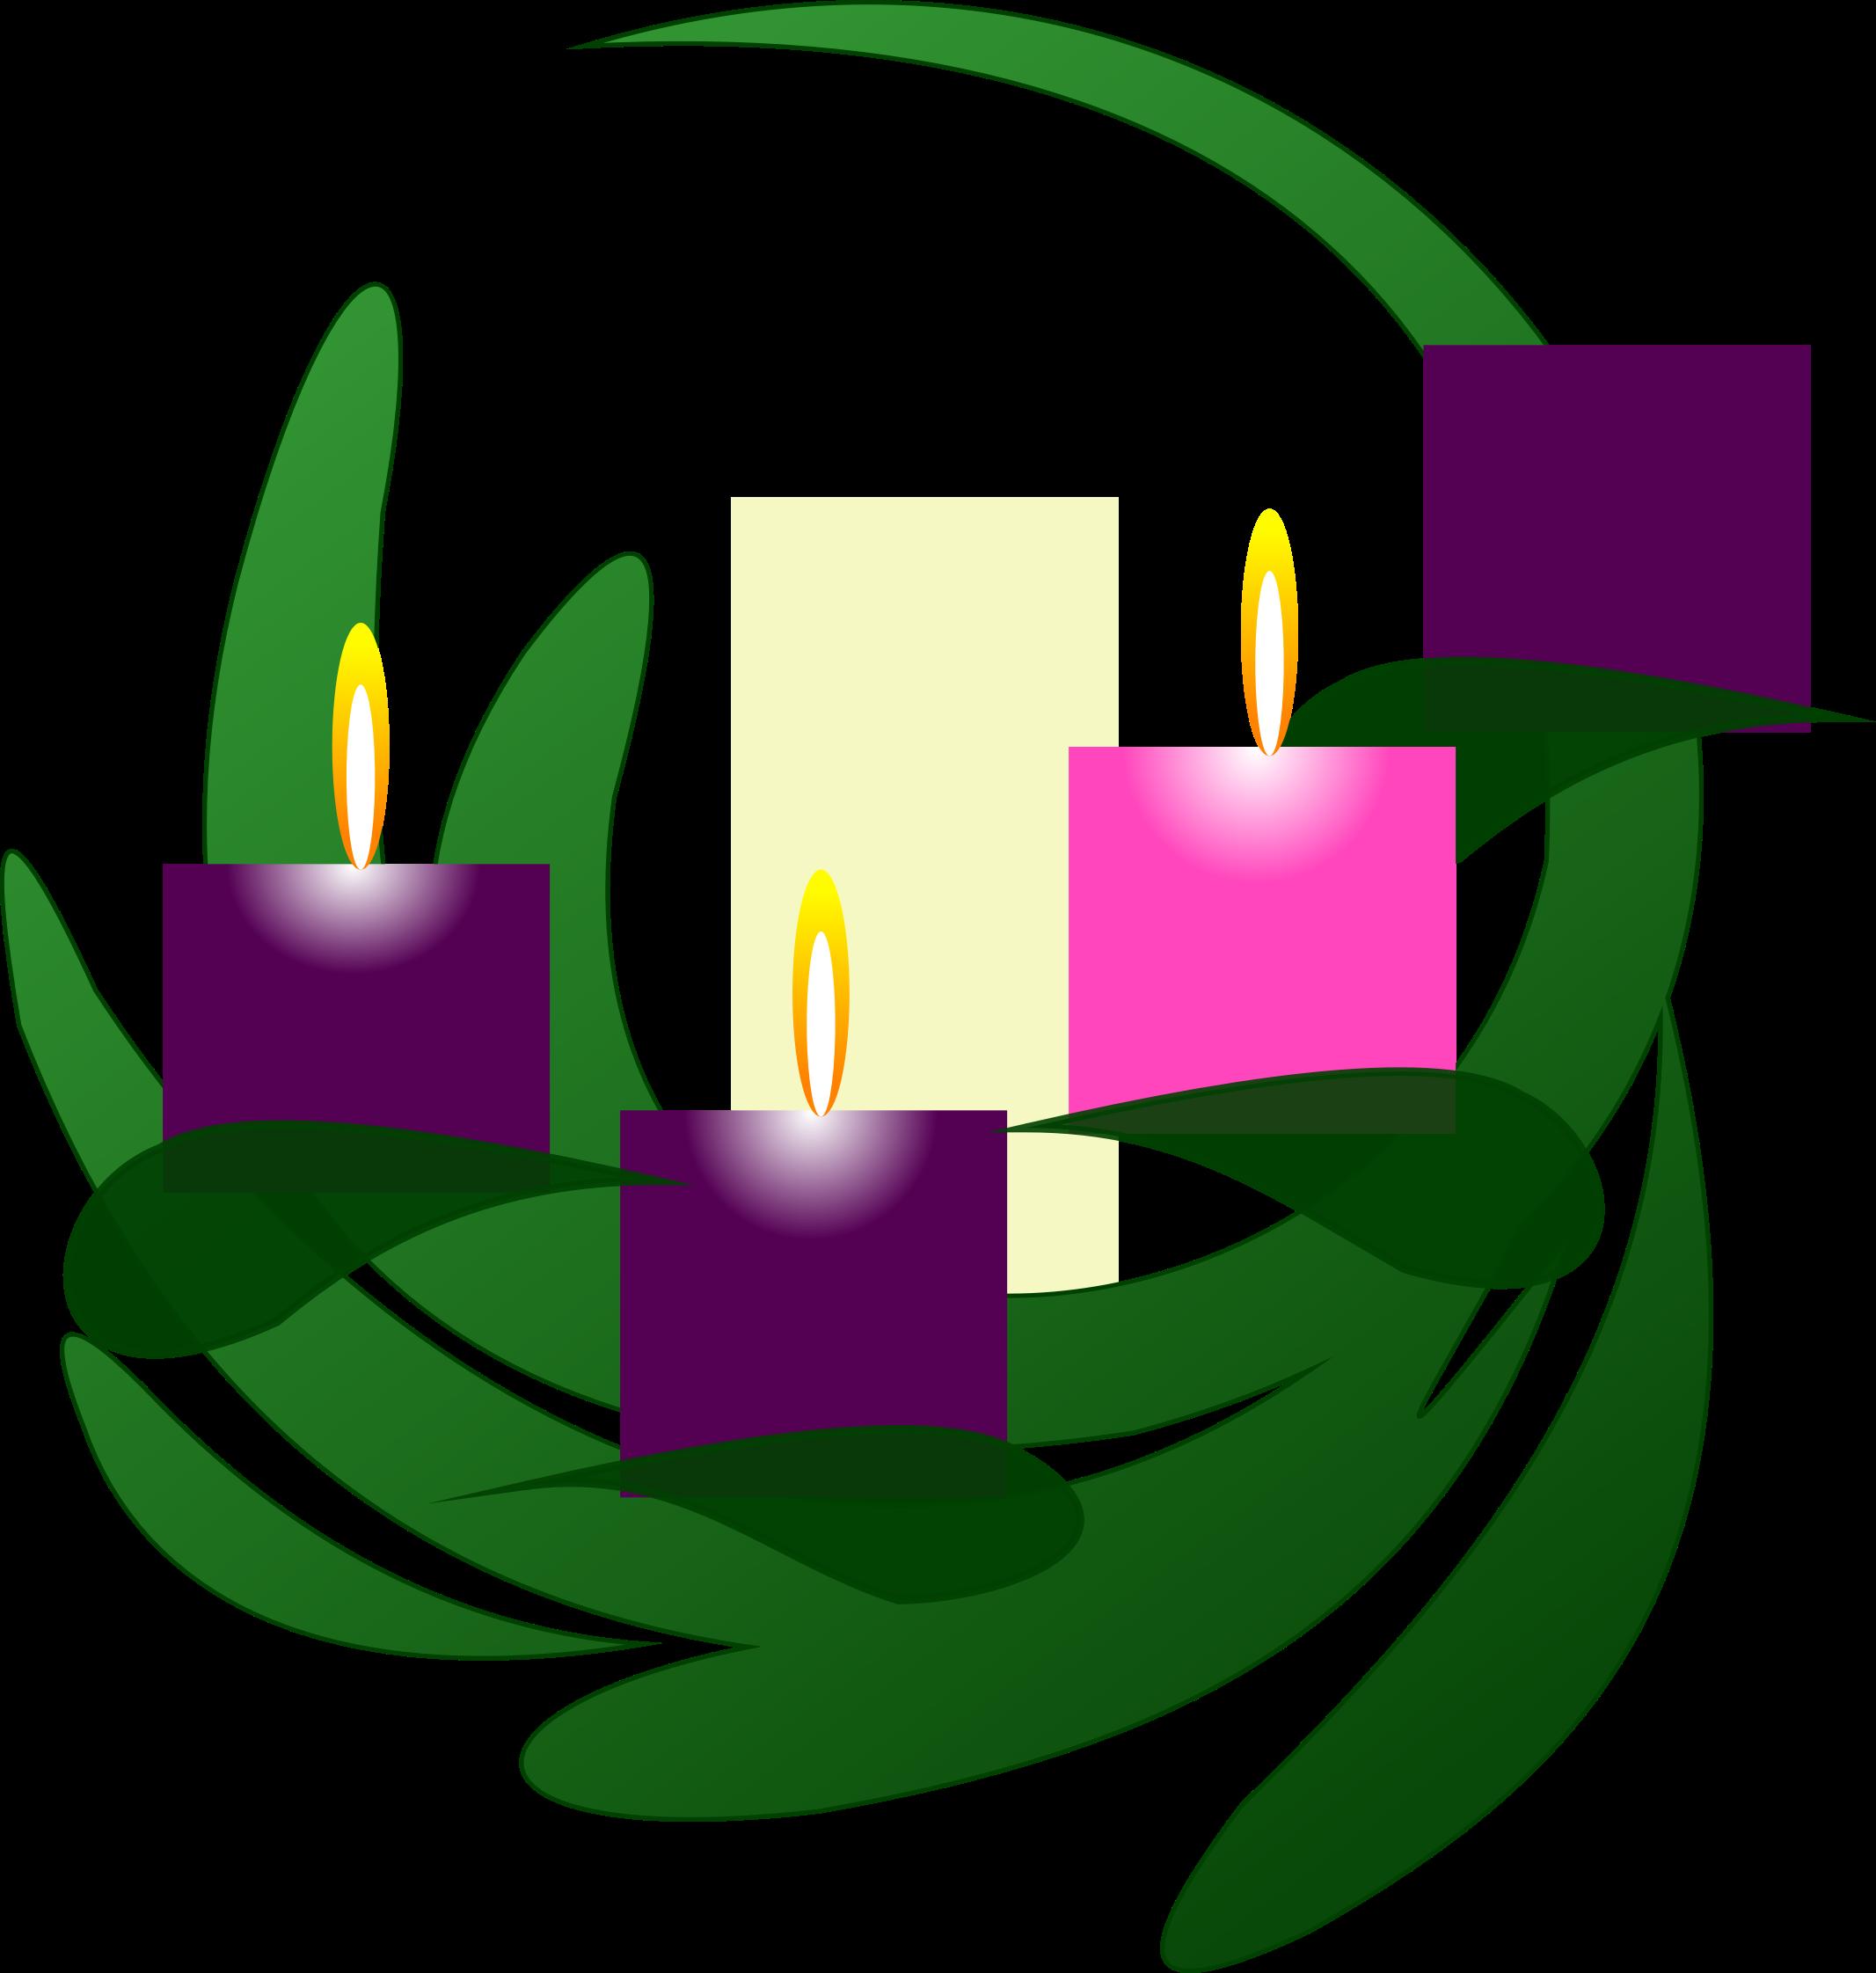 graphic transparent download Clipart advent wreath. Big image png